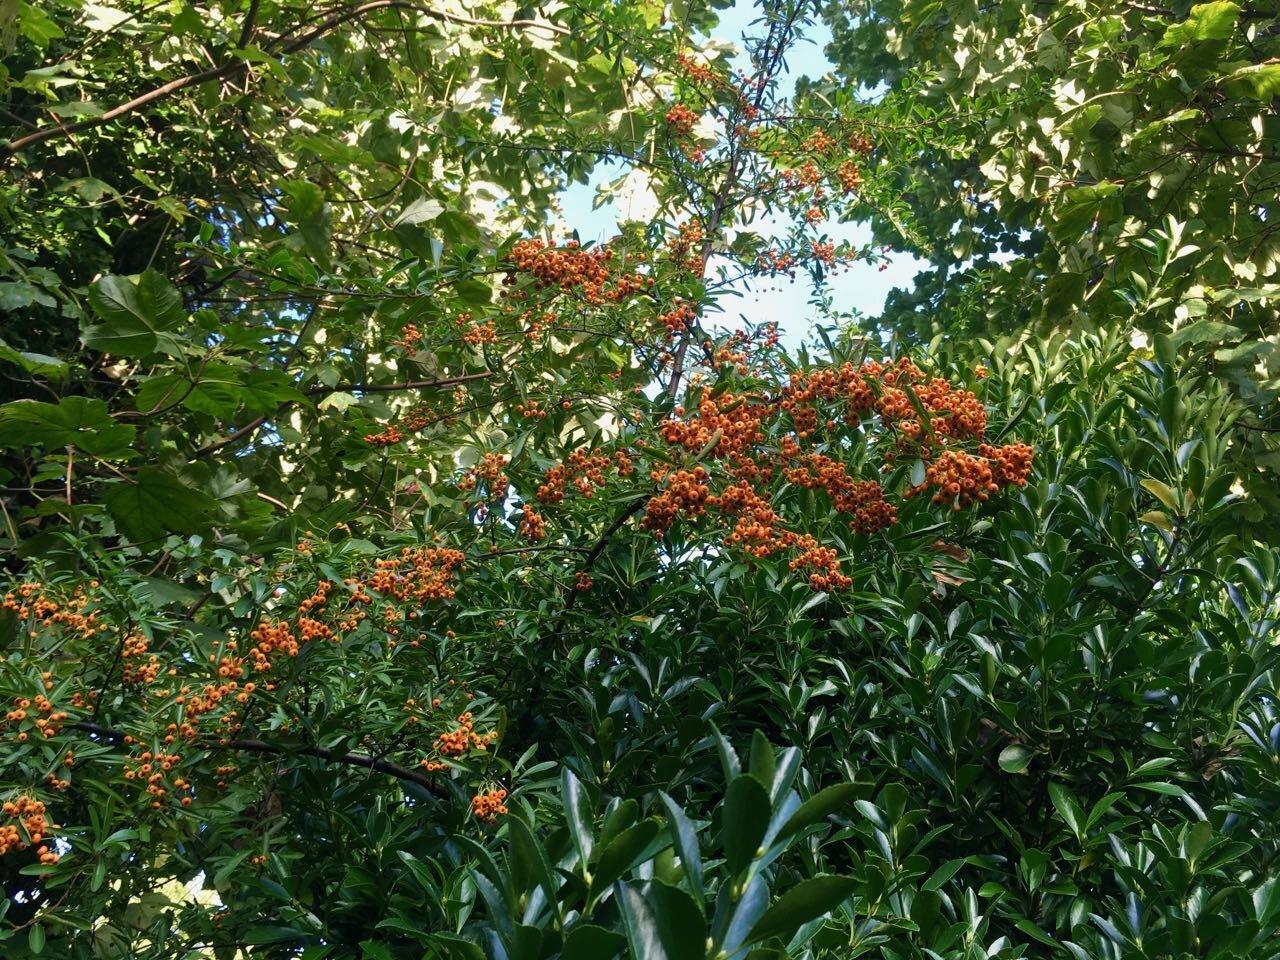 orange berries on the pyracantha